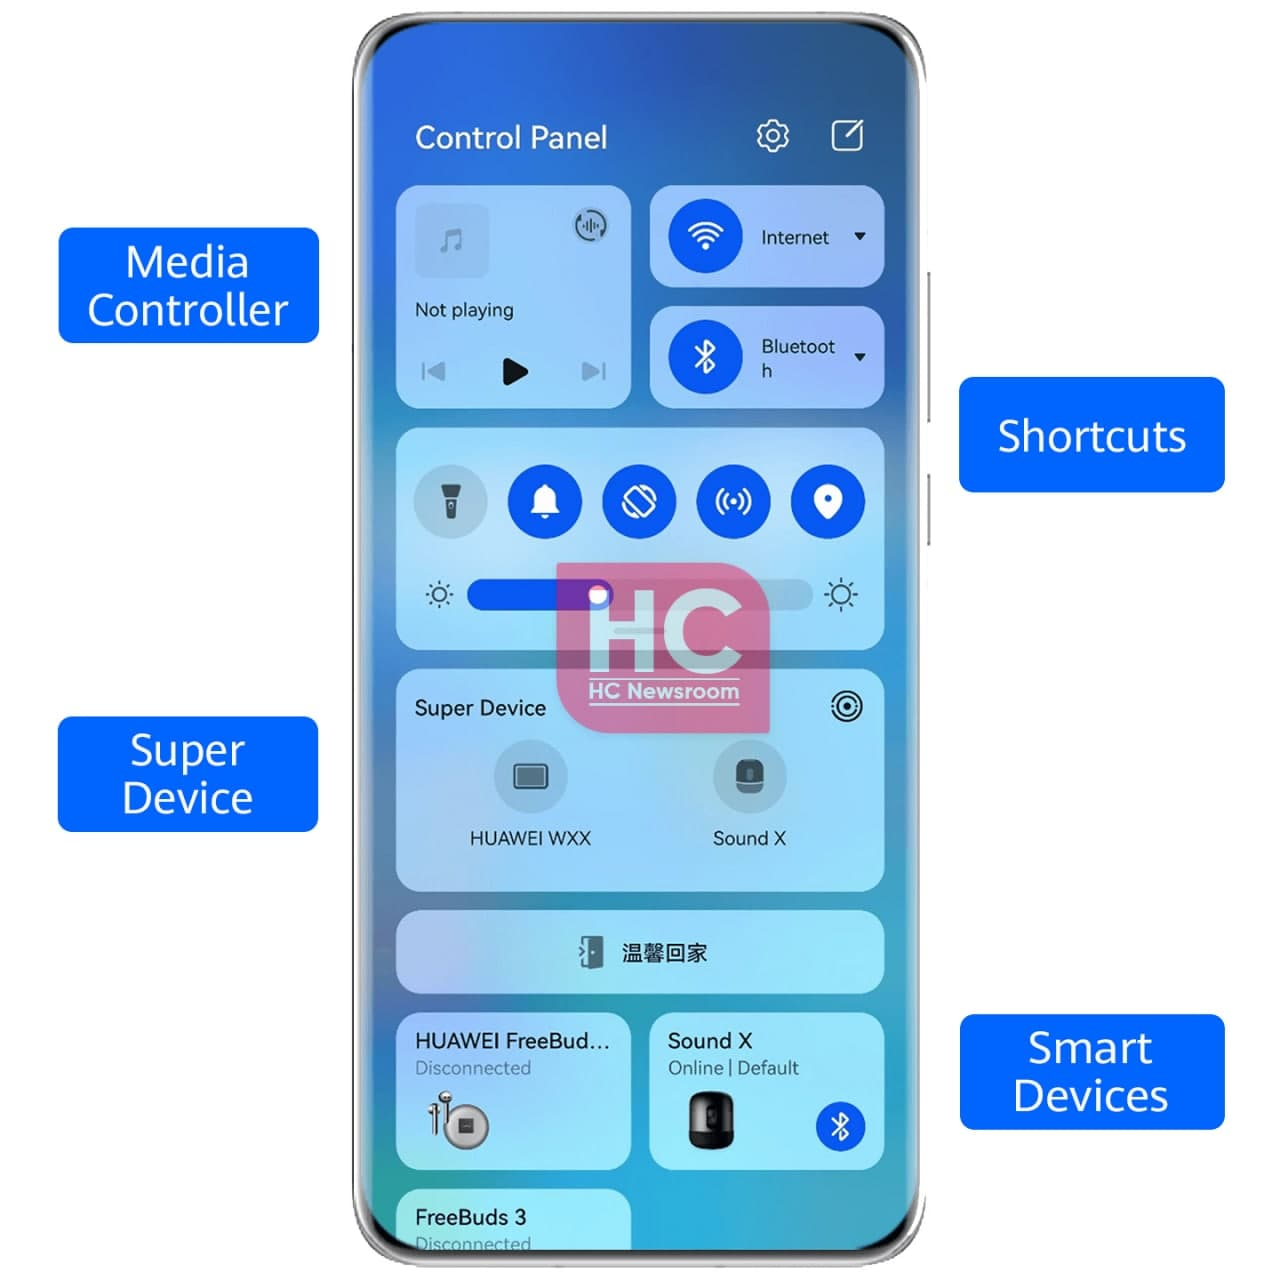 HarmonyOS Control panel